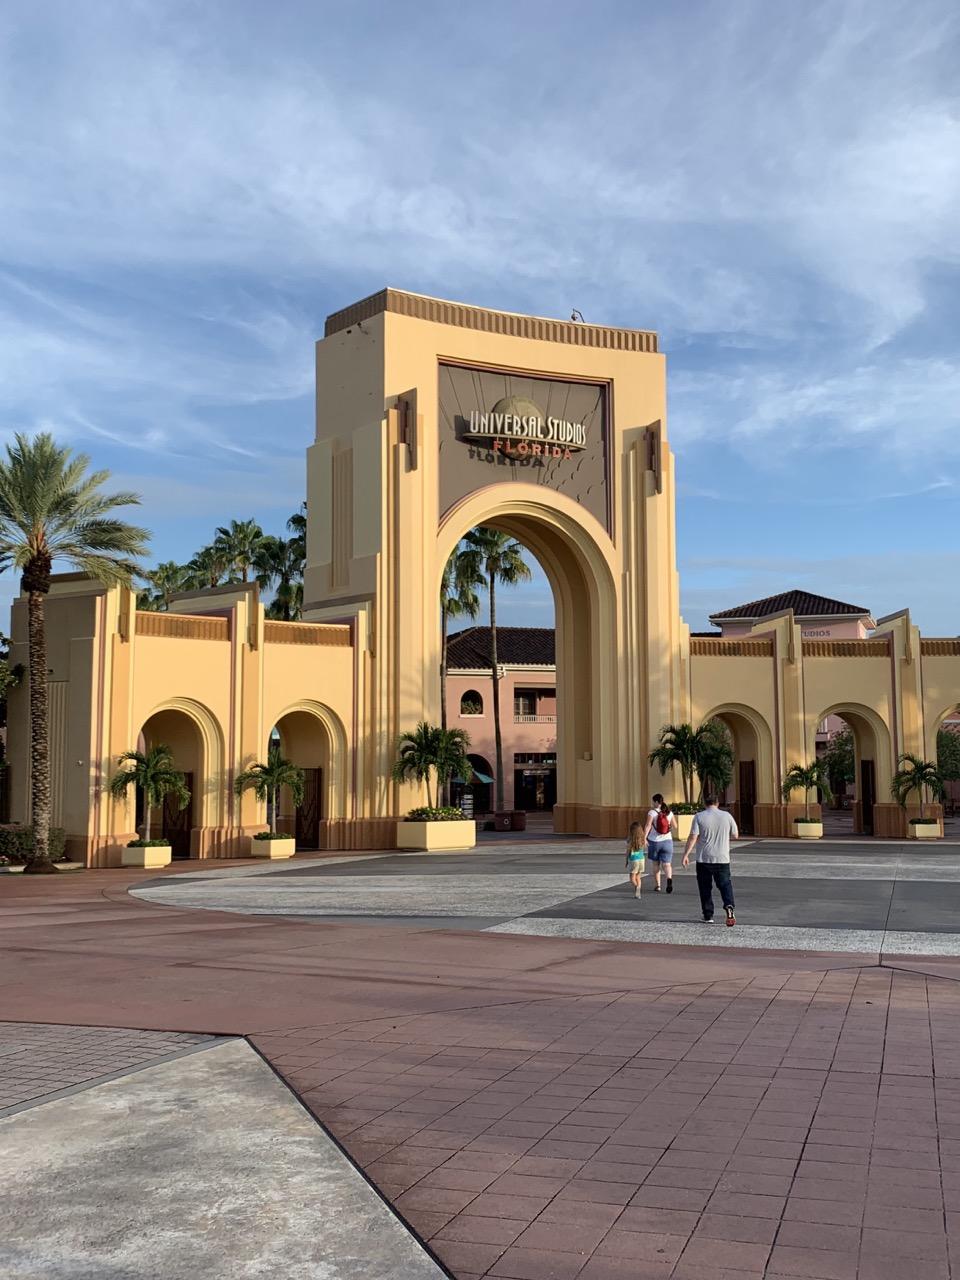 universal studios florida one day plan itinerary 01 morning.jpeg